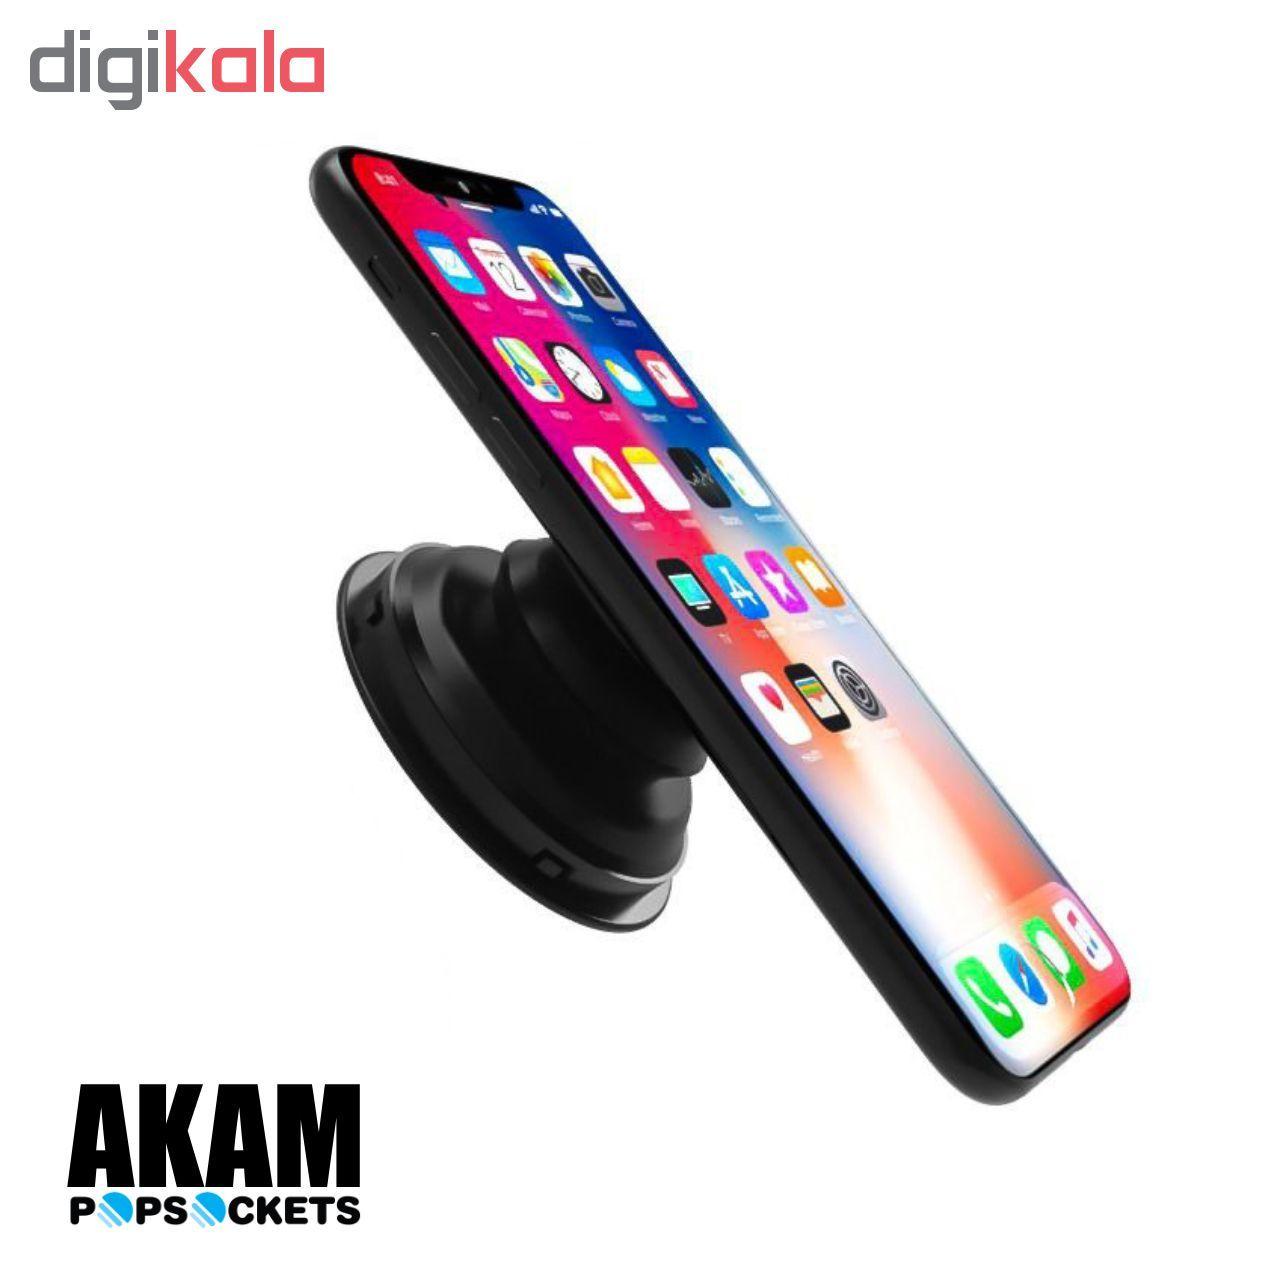 پایه نگهدارنده گوشی موبایل پاپ سوکت آکام مدل APS0168 main 1 6